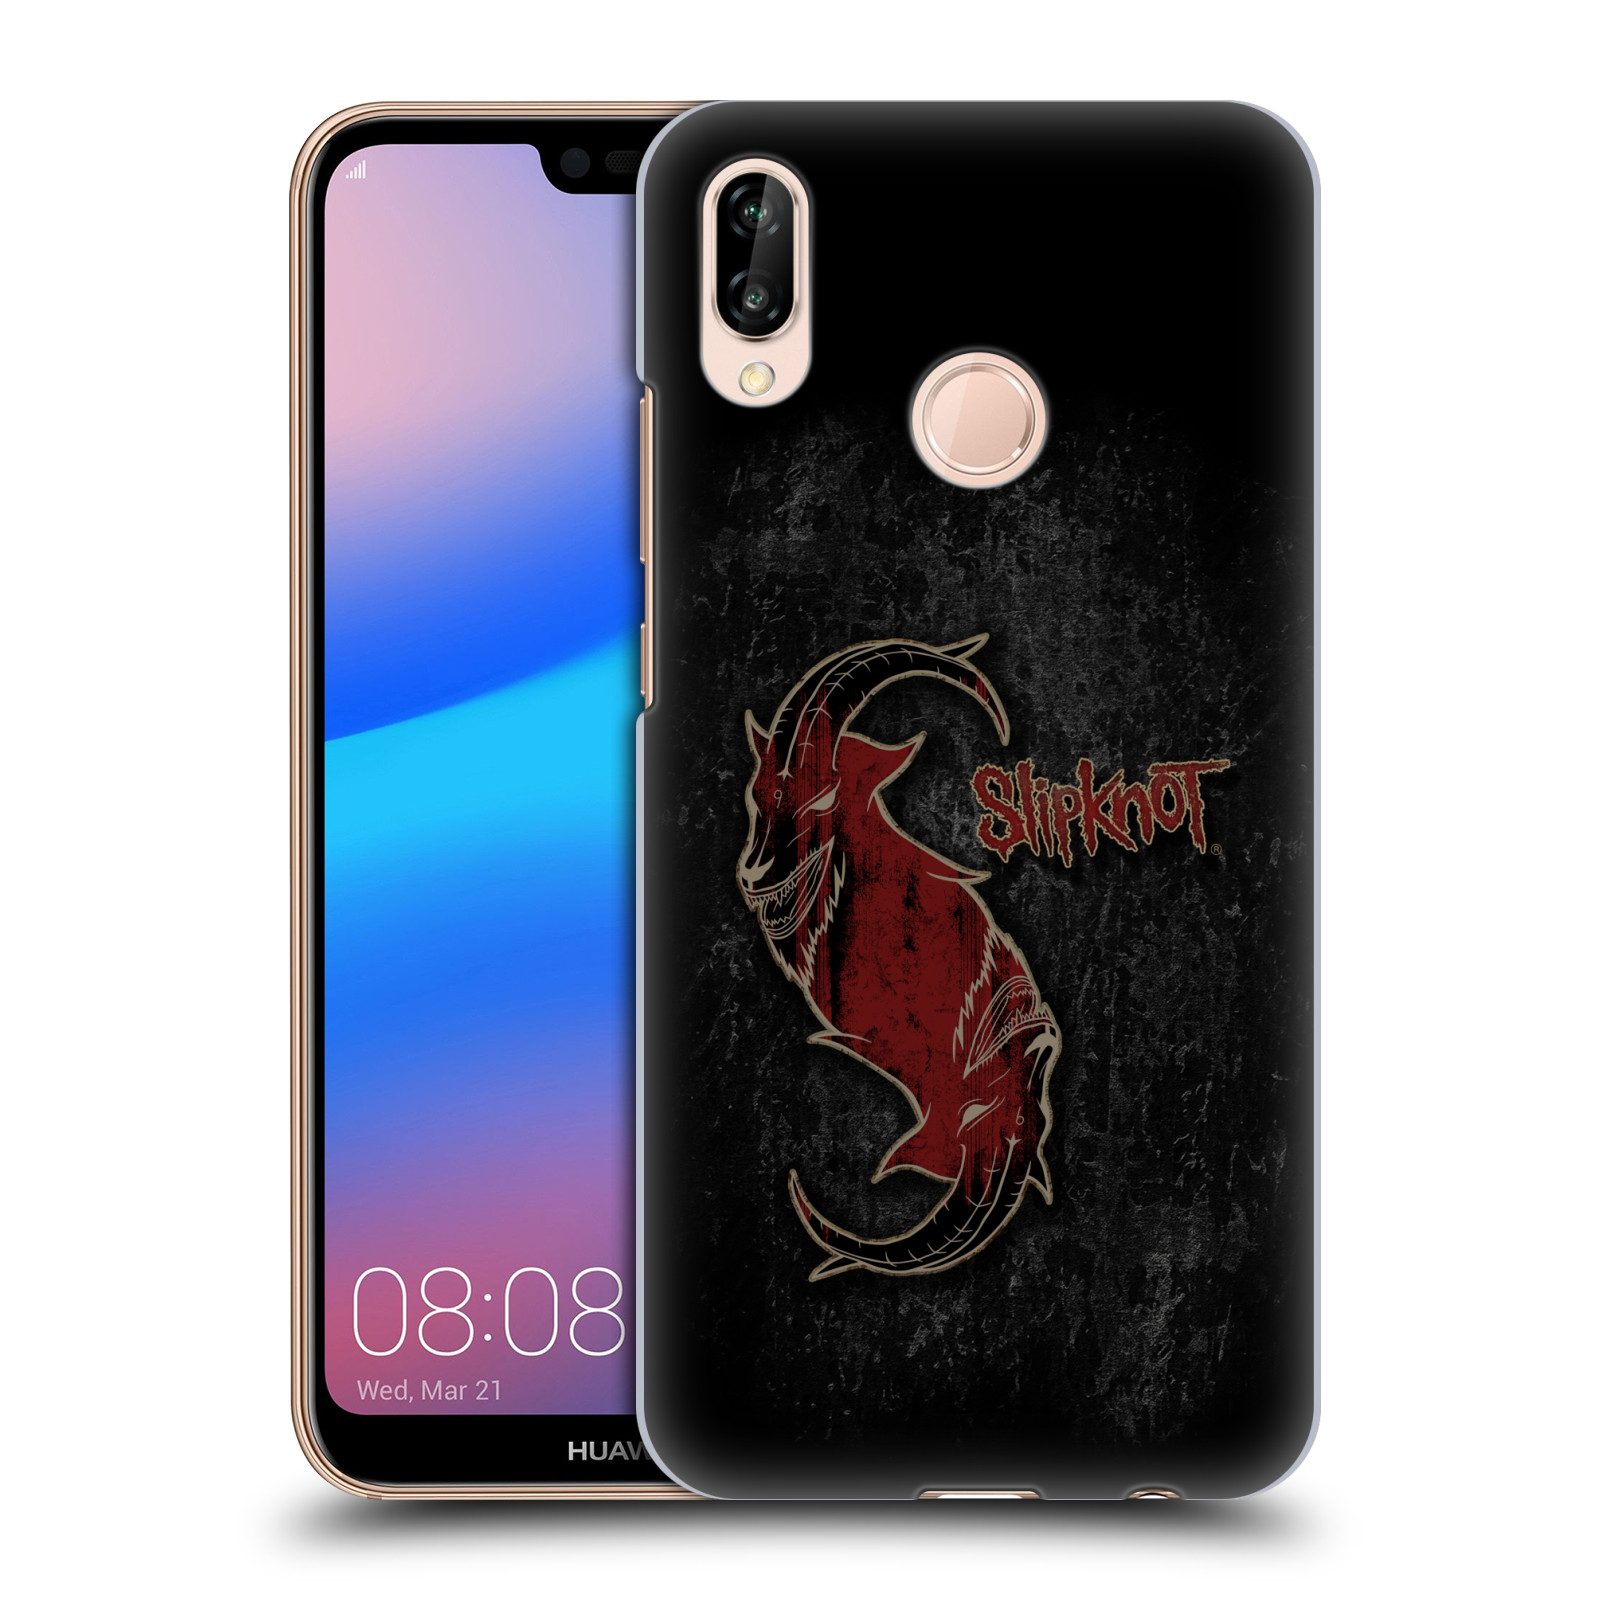 Plastové pouzdro na mobil Huawei P20 Lite - Head Case - Slipknot - Rudý kozel